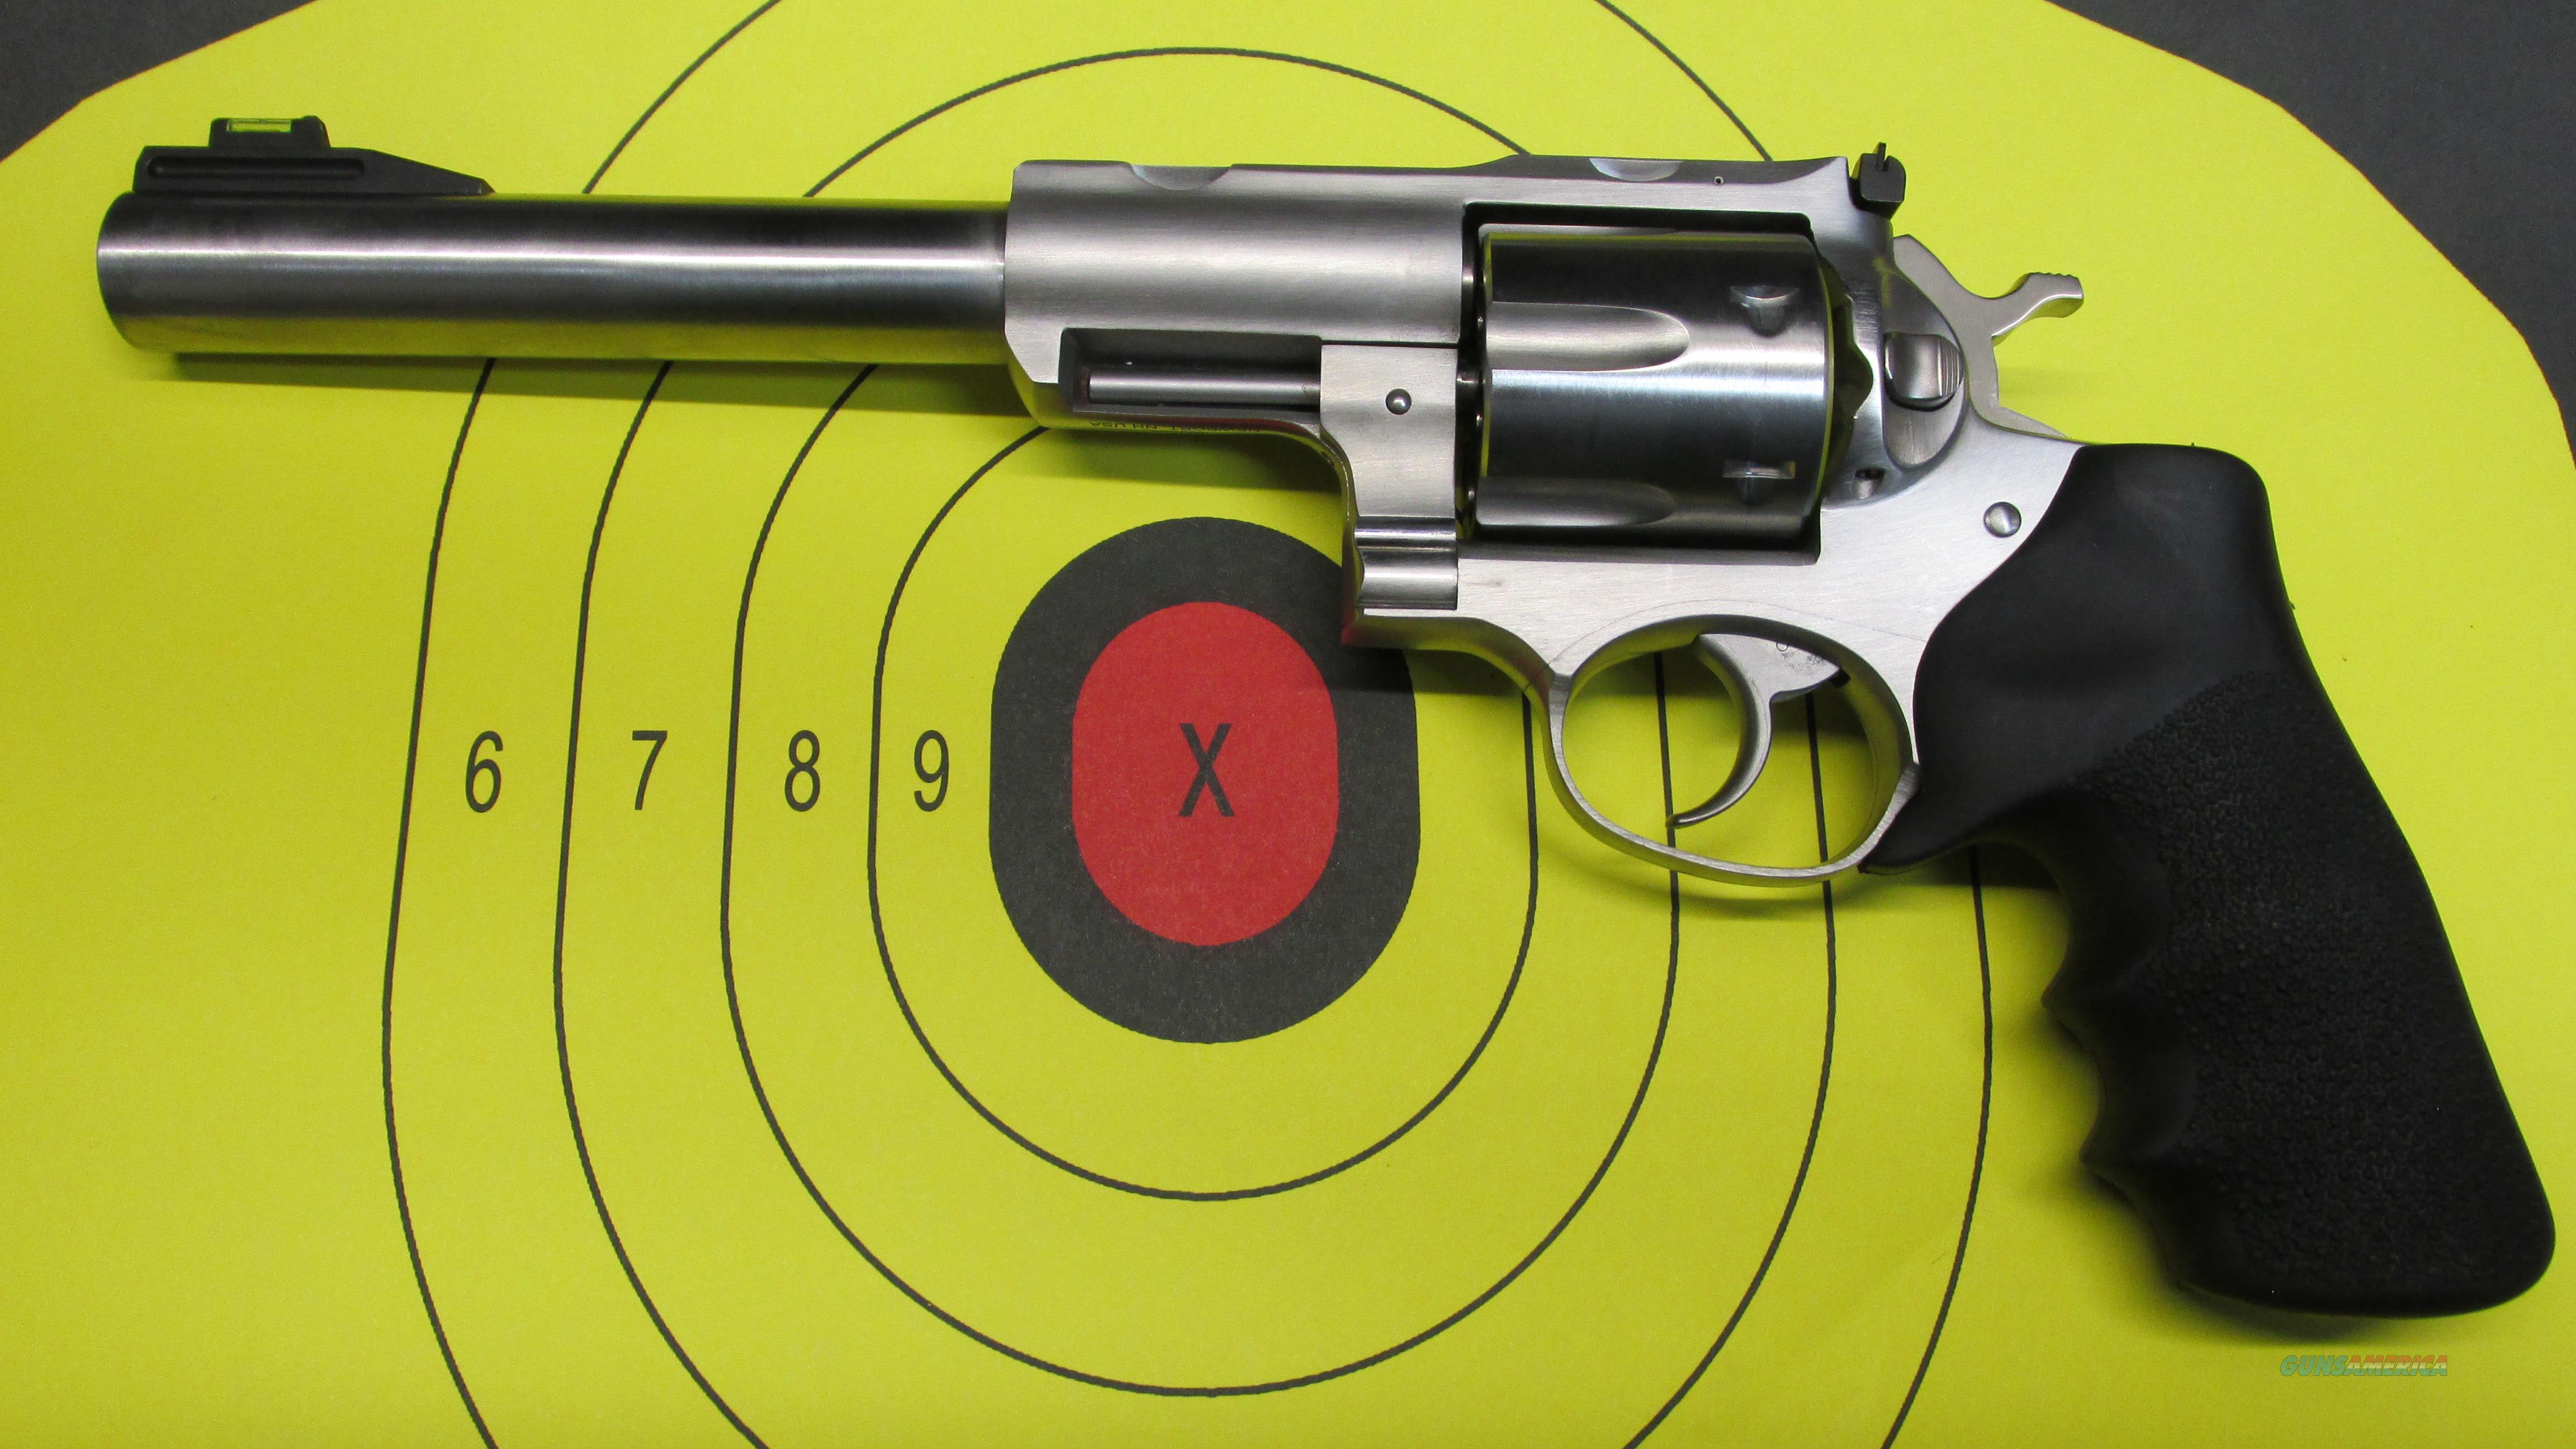 RUGER SUPER REDHAWK 44MAG REVOLVER  Guns > Pistols > Ruger Double Action Revolver > Redhawk Type